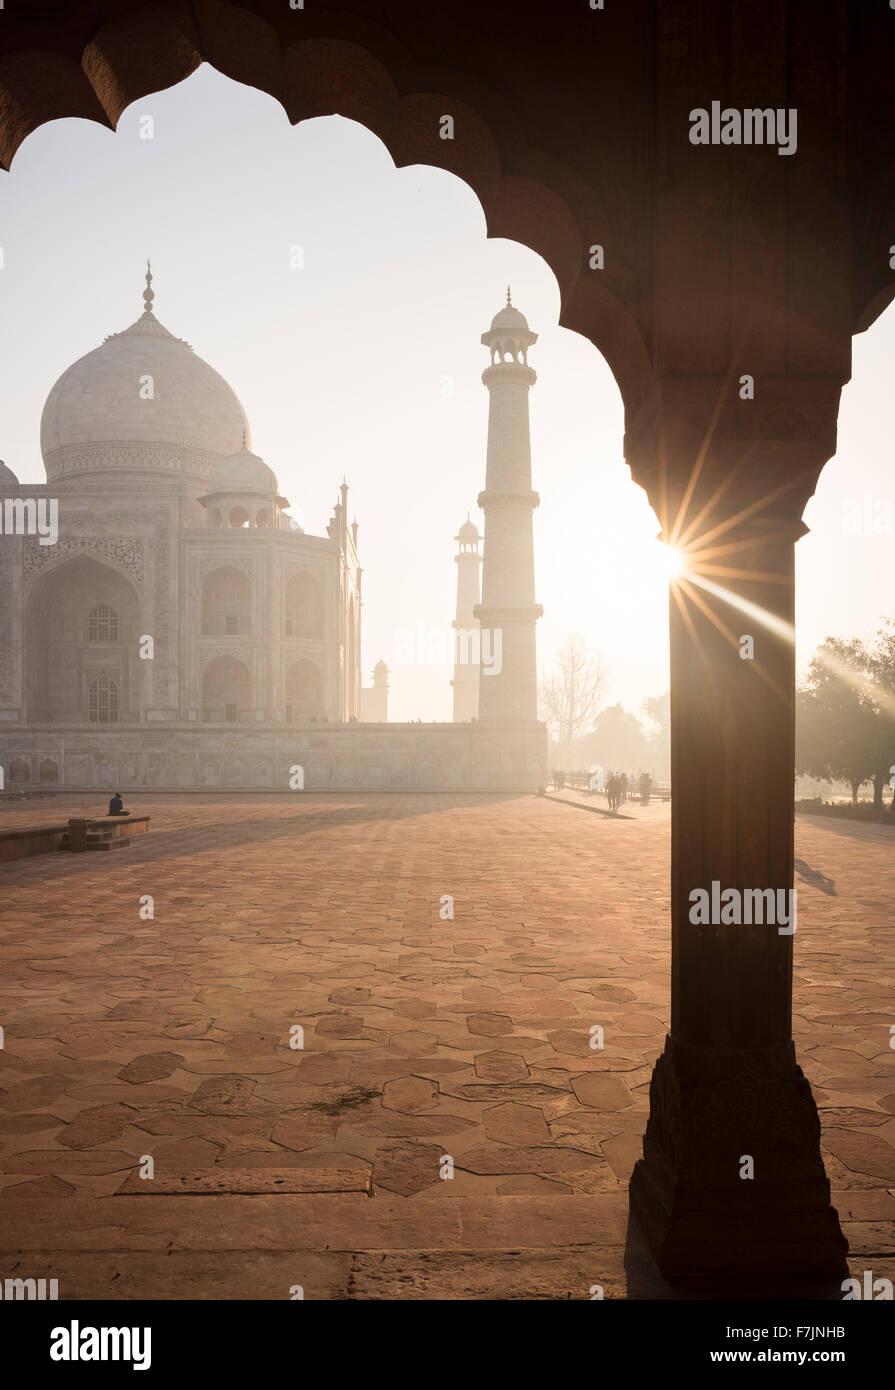 Dawn at The Taj Mahal, Agra, Uttar Pradesh, India - Stock Image